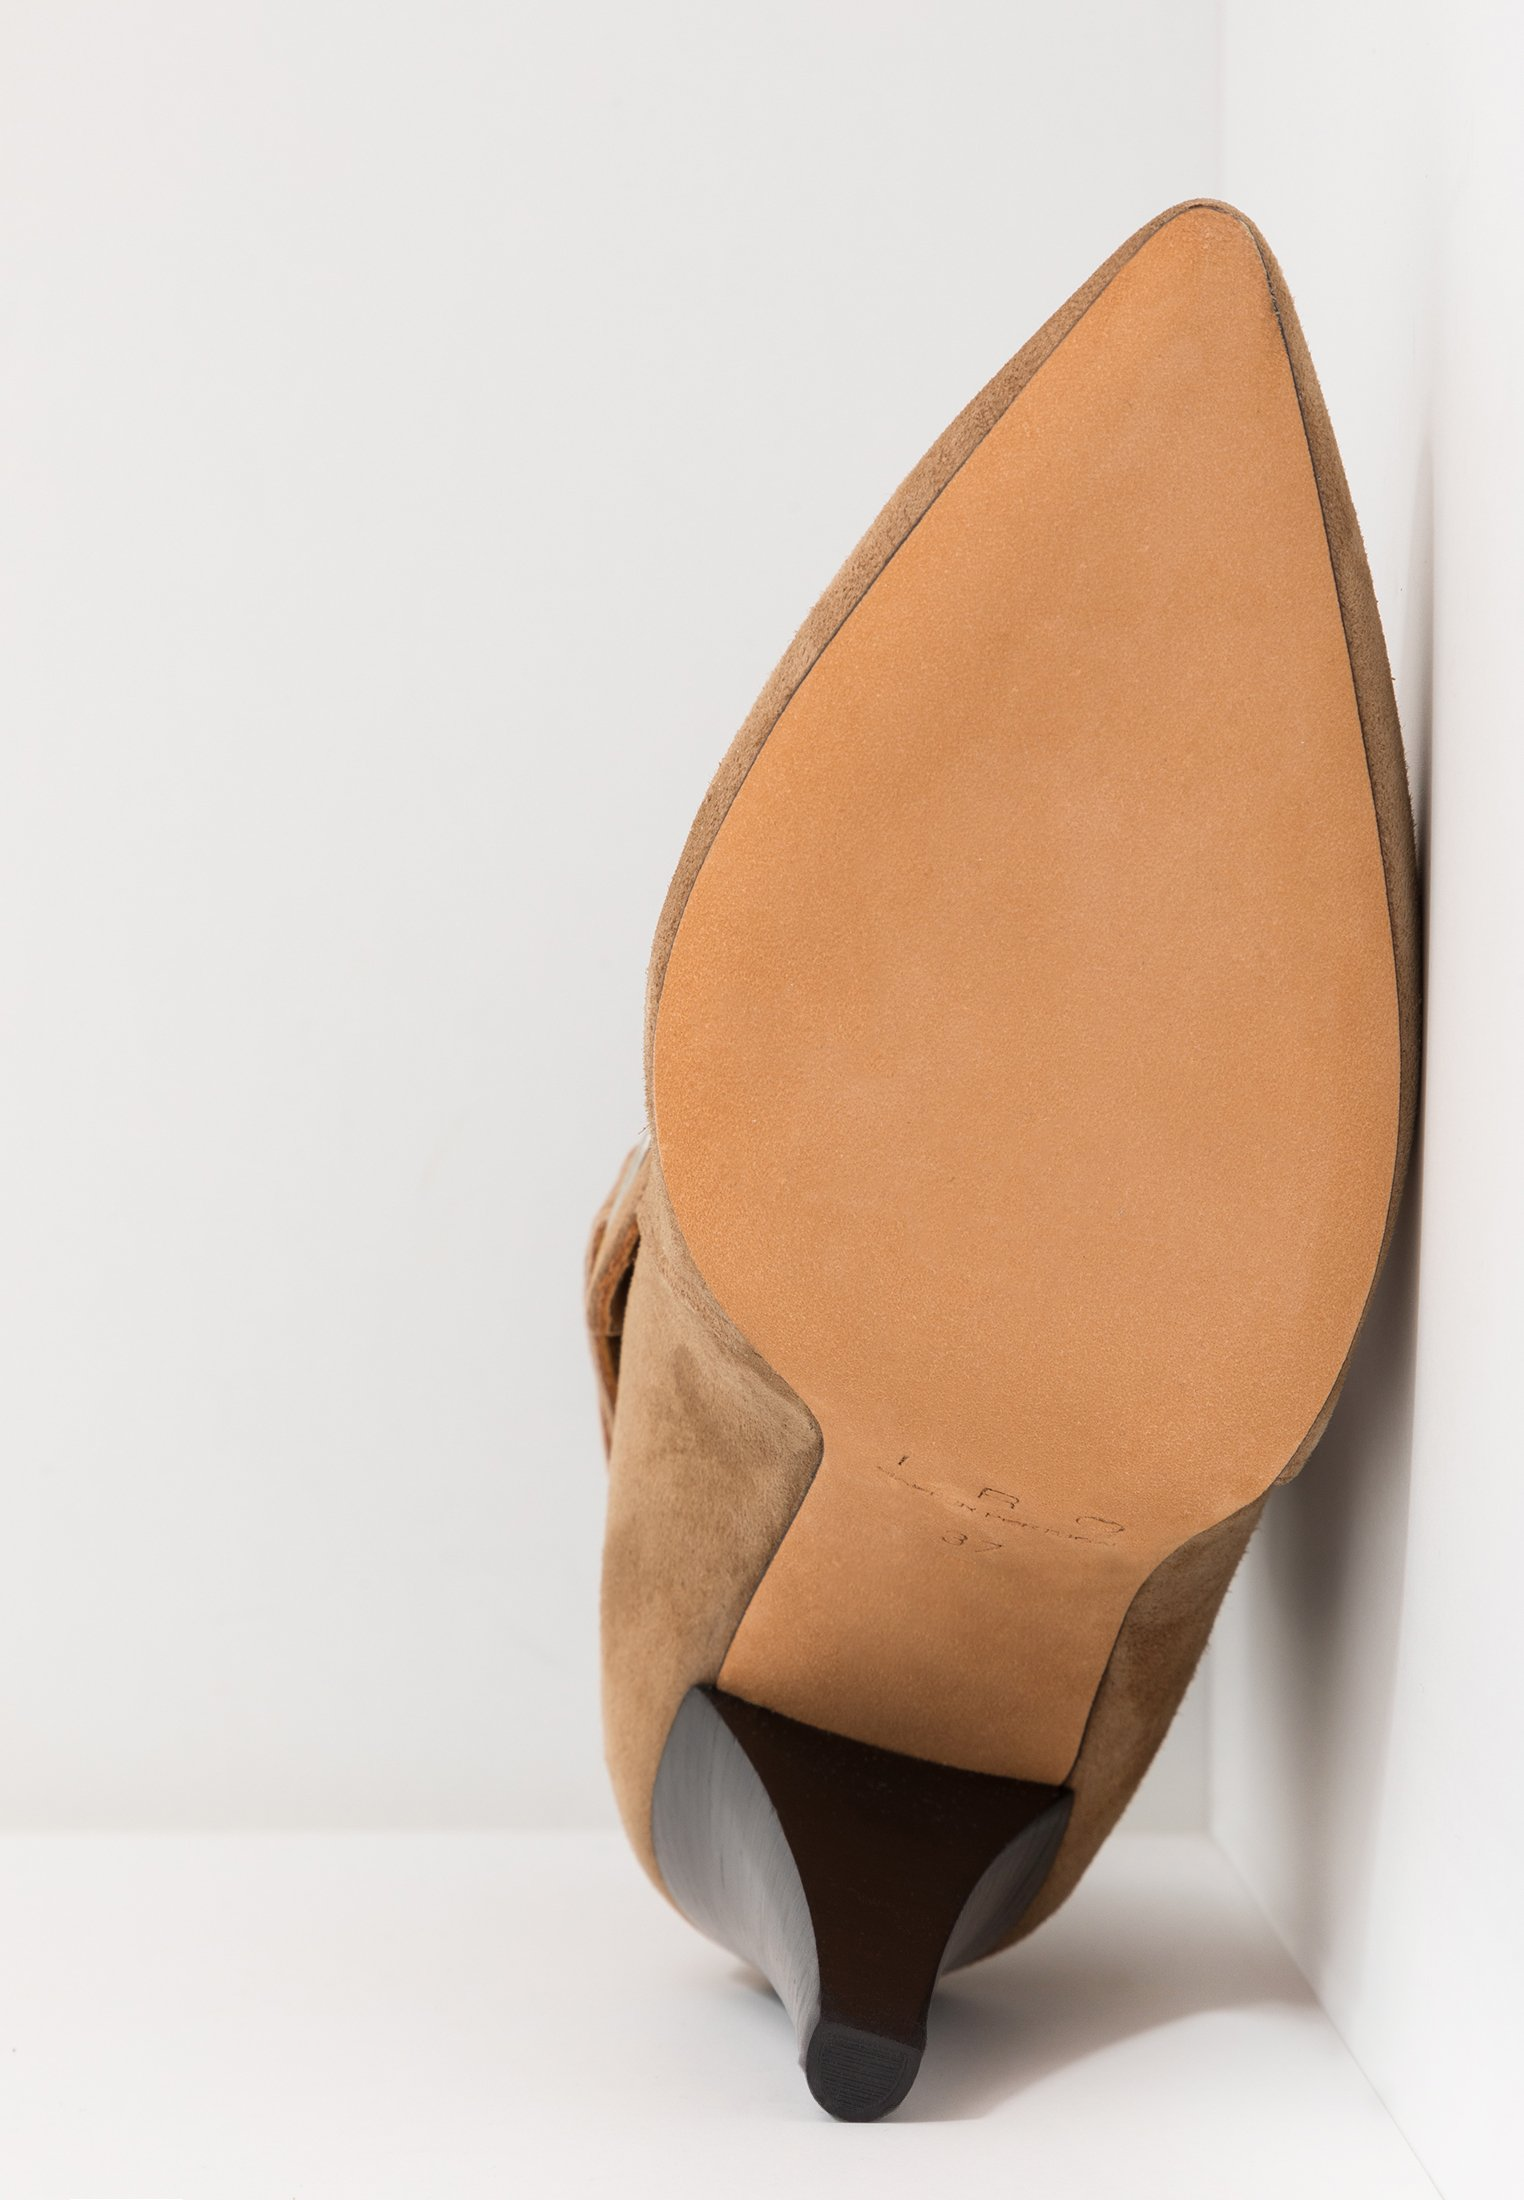 Iro GRANDOS - Bottines à talons hauts camel